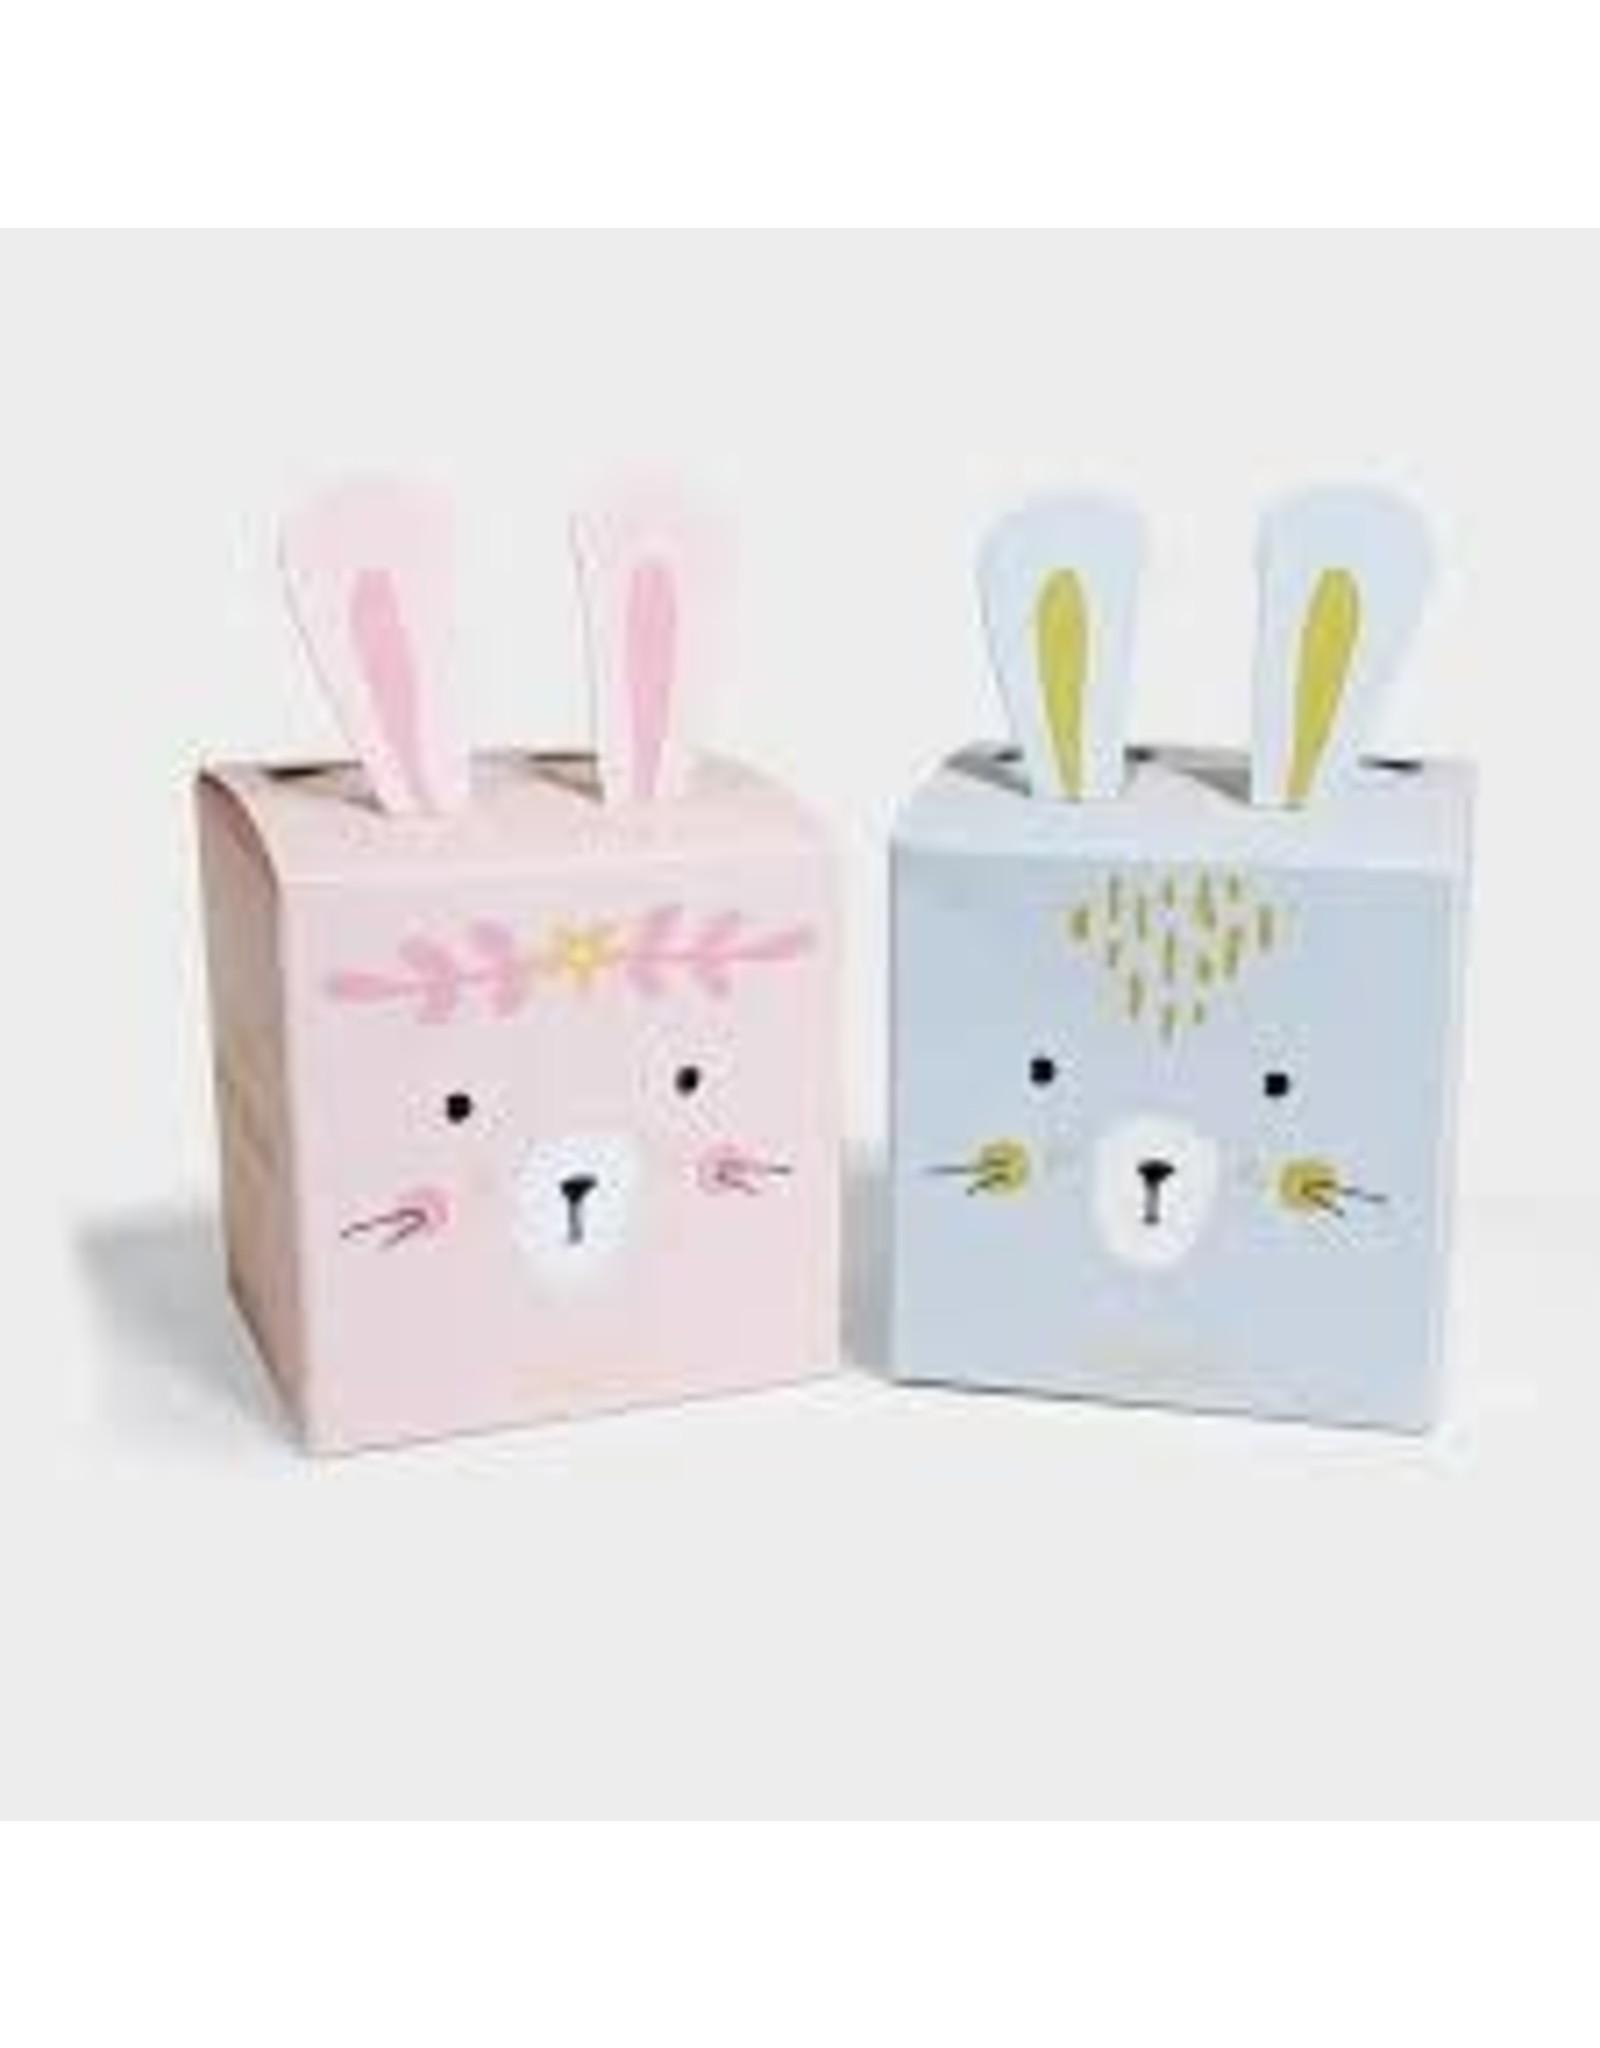 MUSEE BATH Pink Bunny Boxed Bath Balm